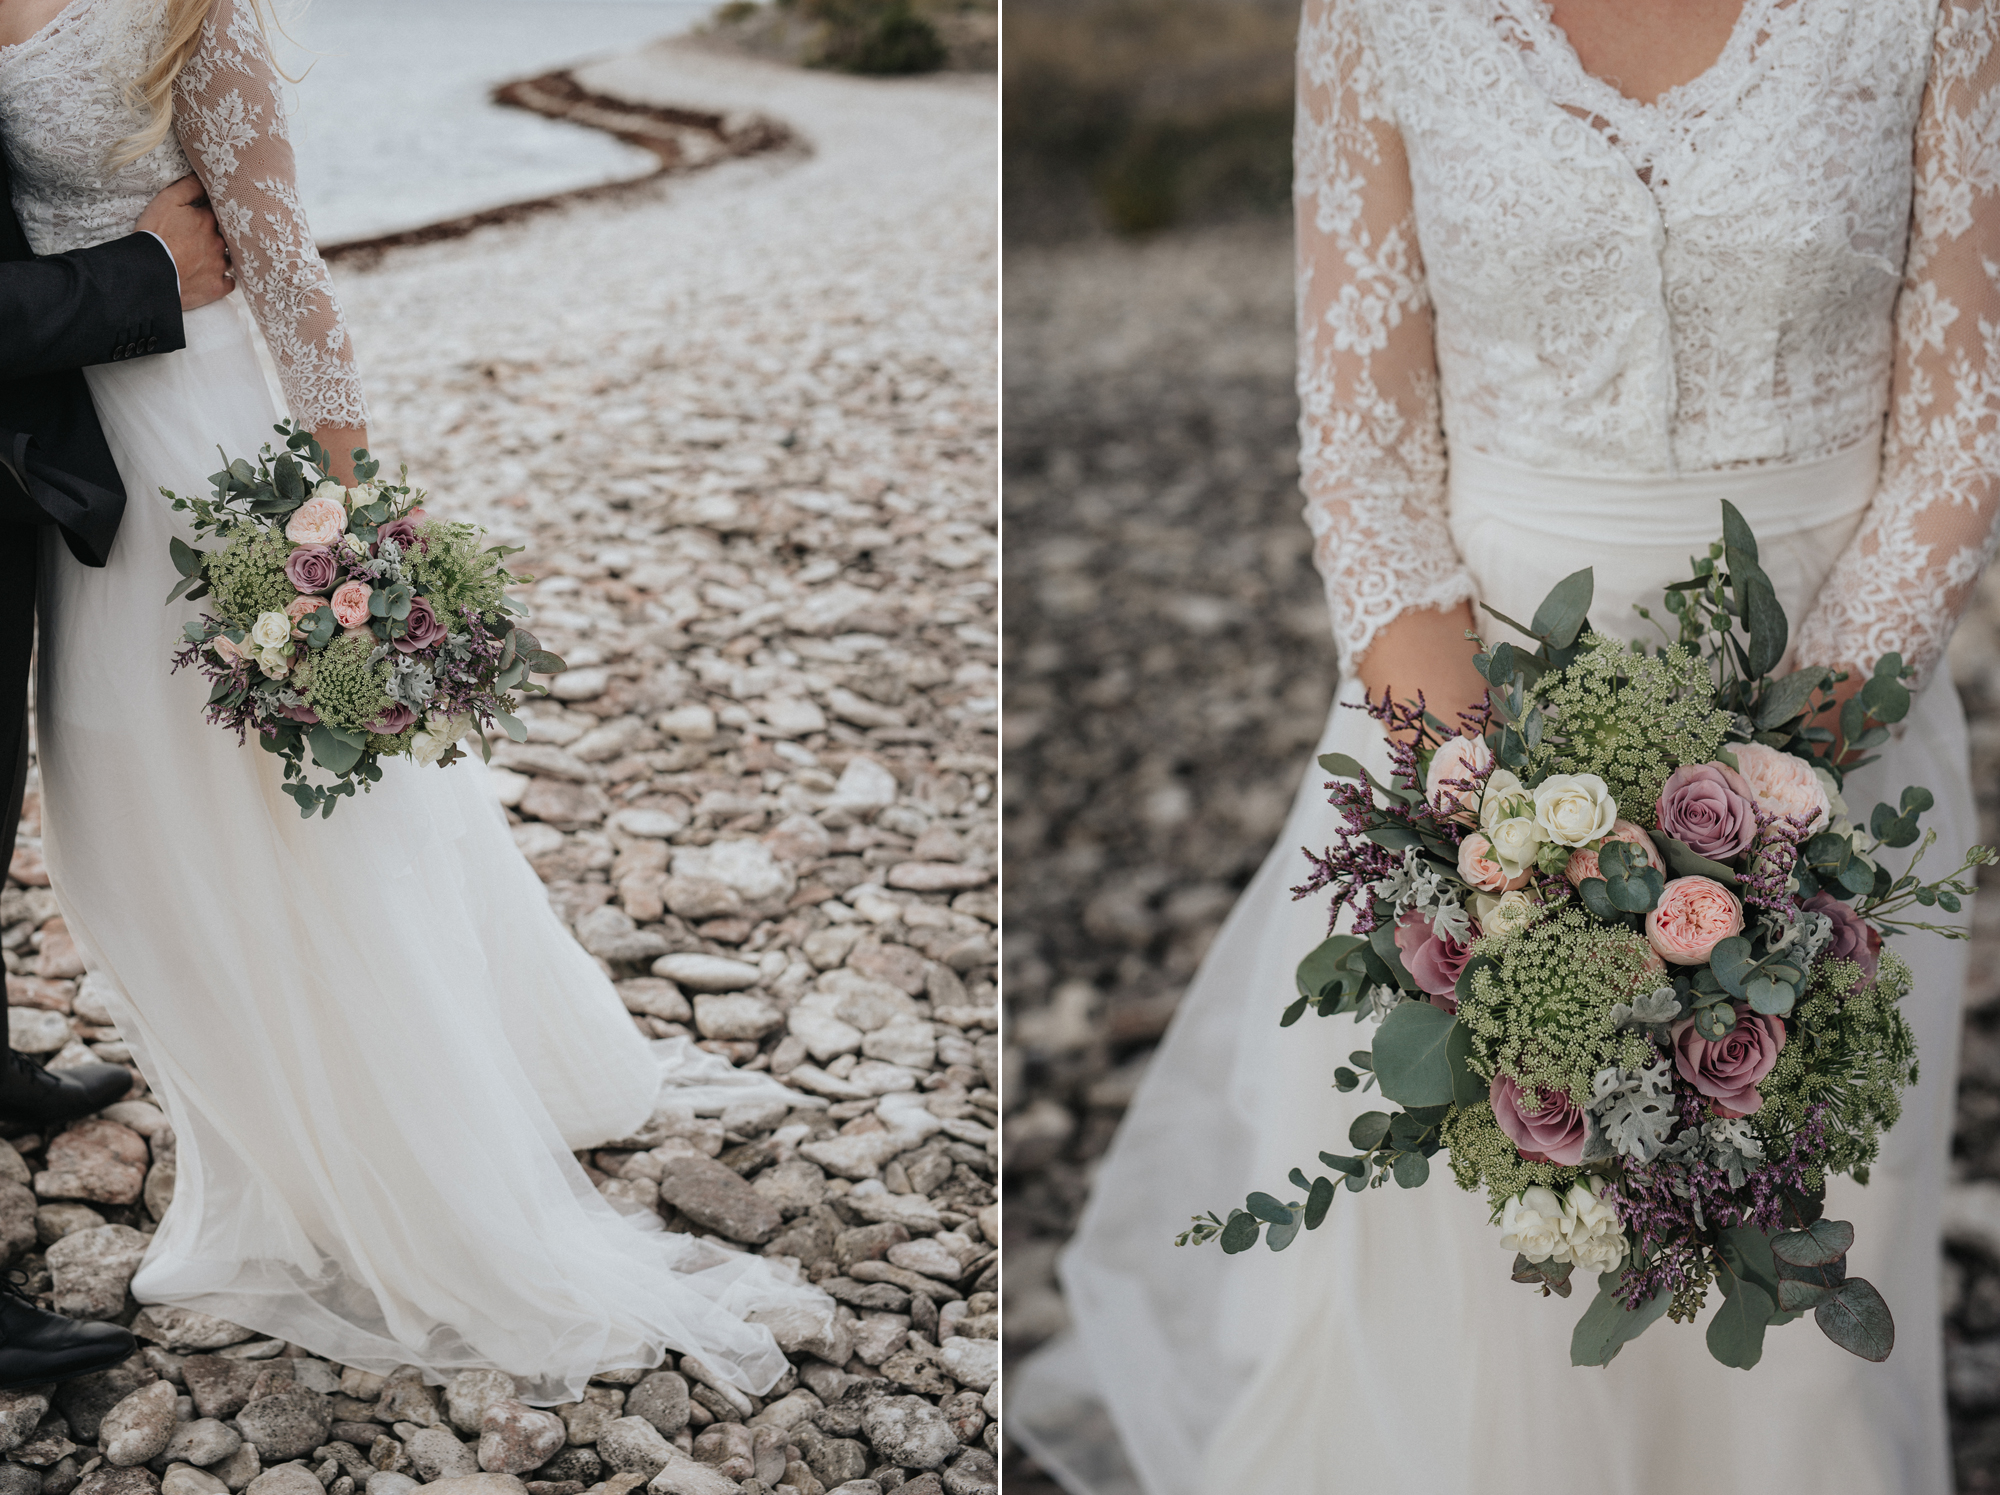 034-irisdals-blomsterhandel-brudbukett-neas-fotografi.jpg